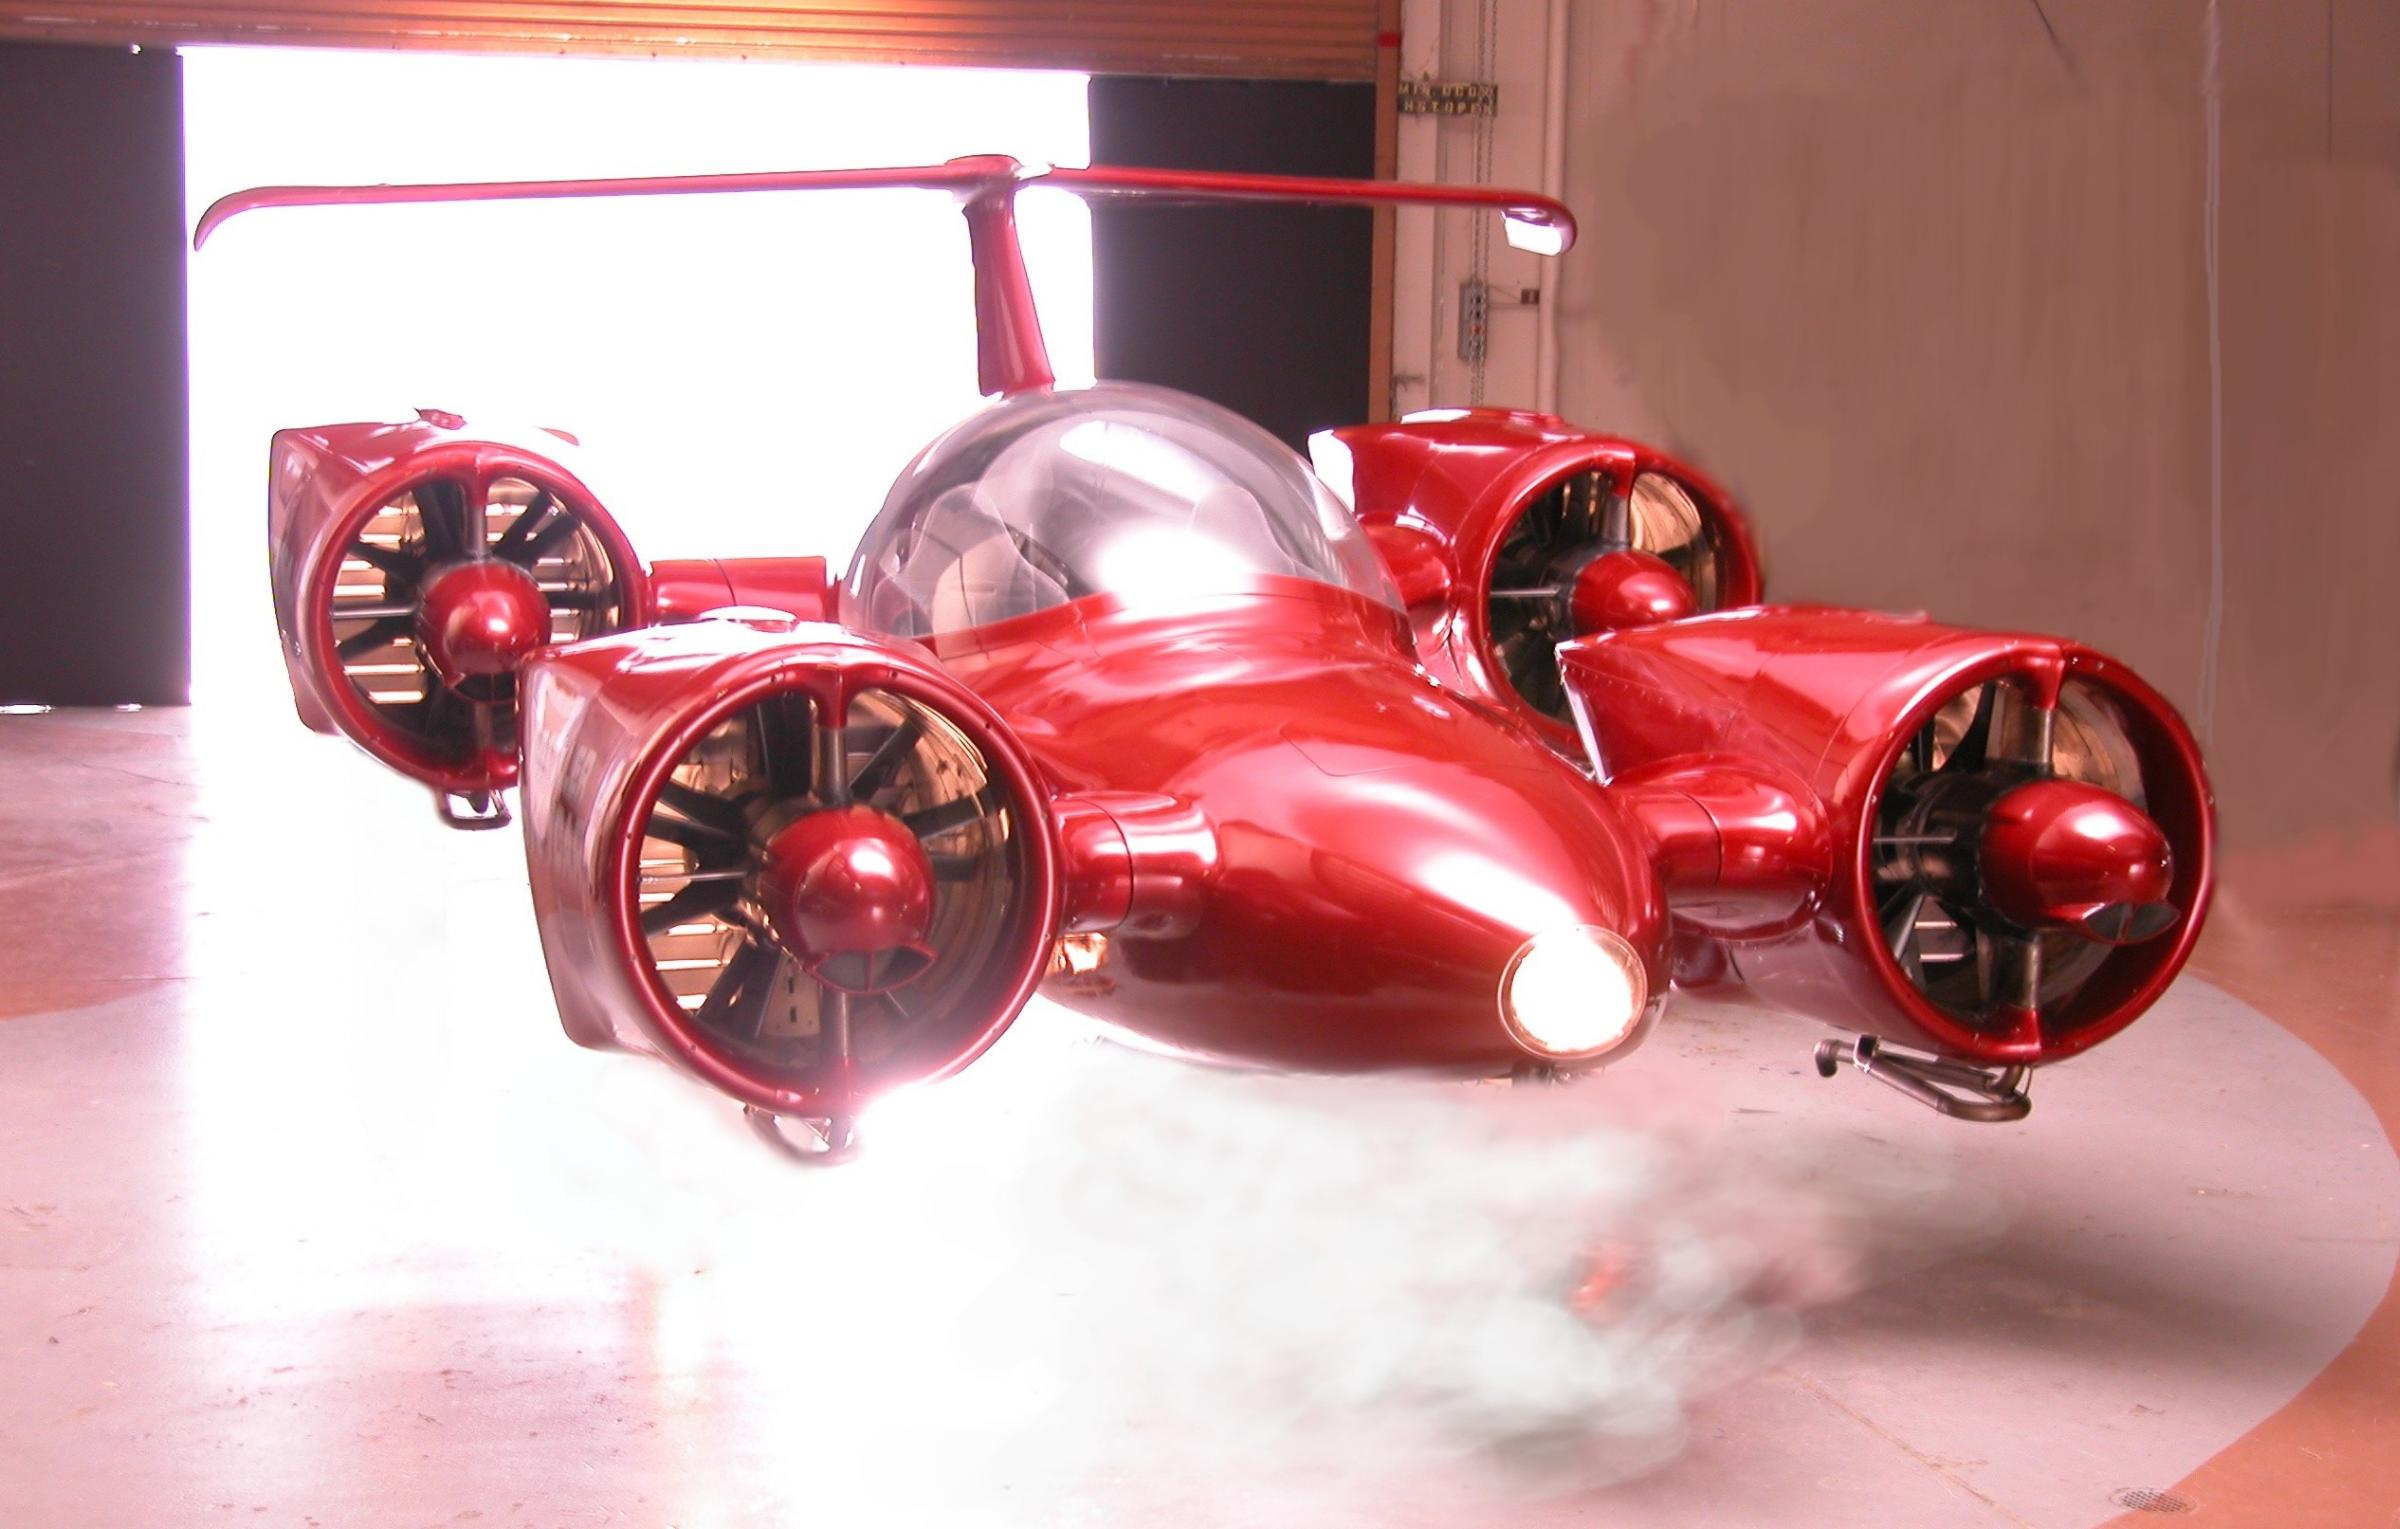 Sweet Cars Gallery EBaums World - Sweet cars